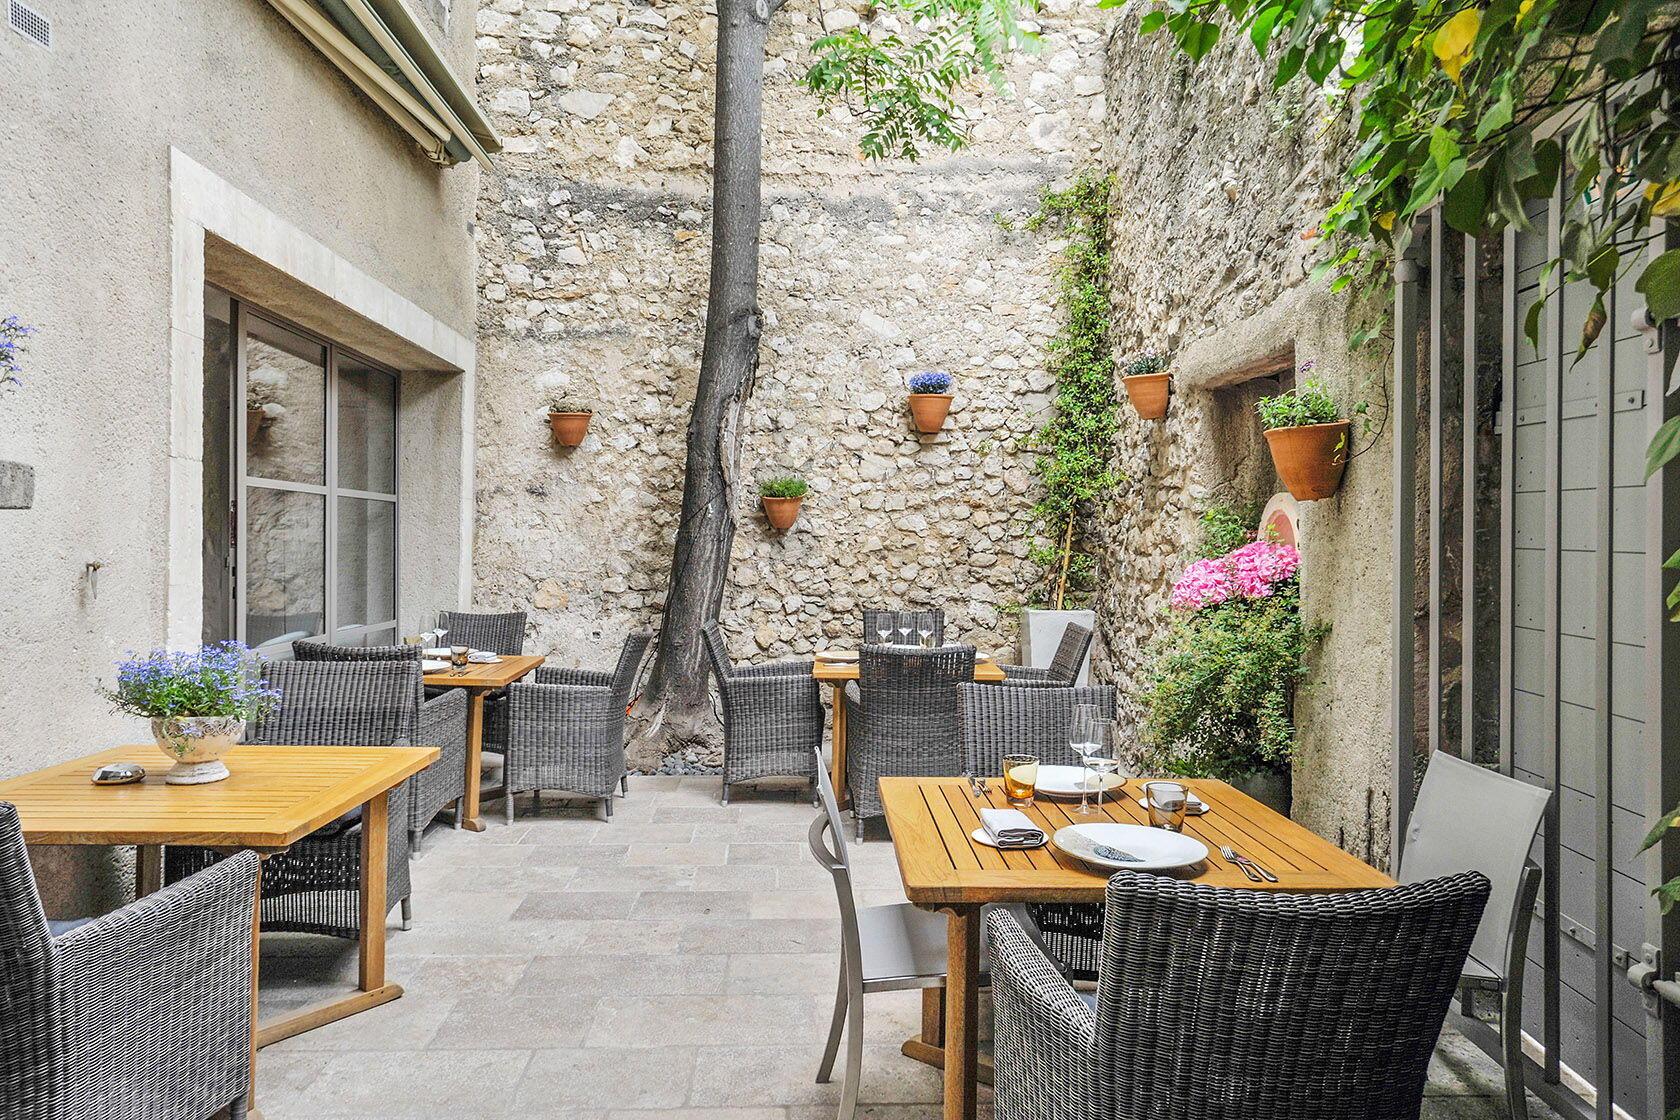 Courtyard Maison Hache Restaurant Eygalières